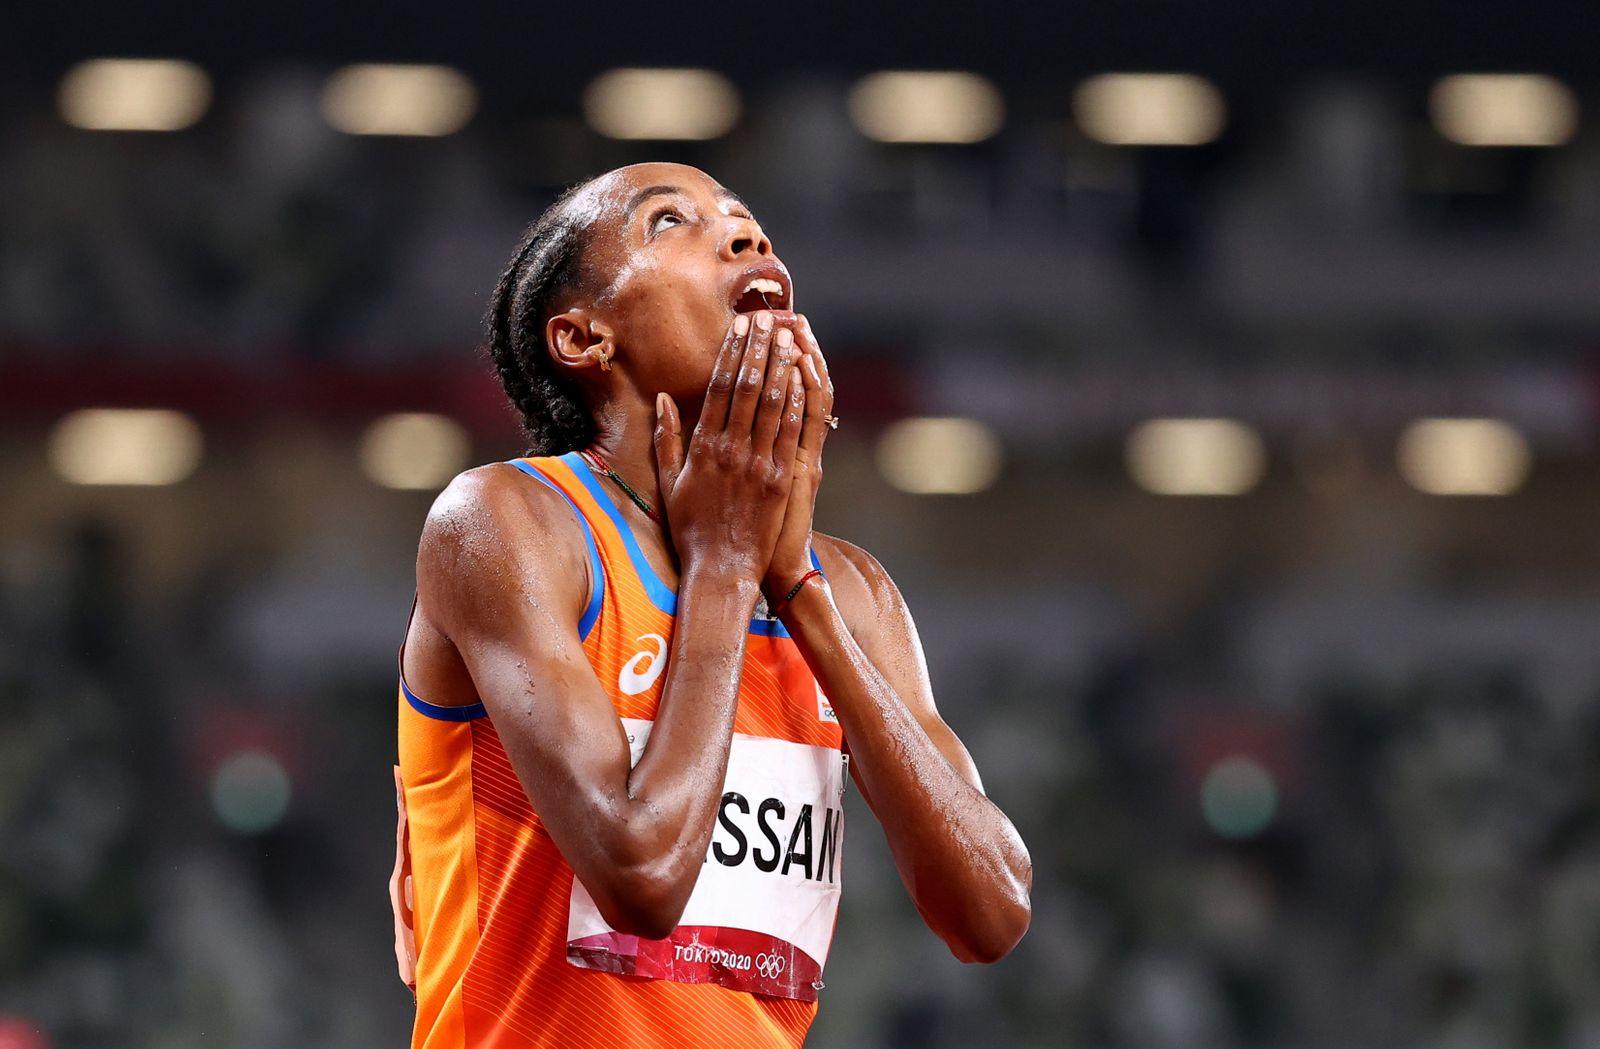 Athletics - Women's 5000m - Final